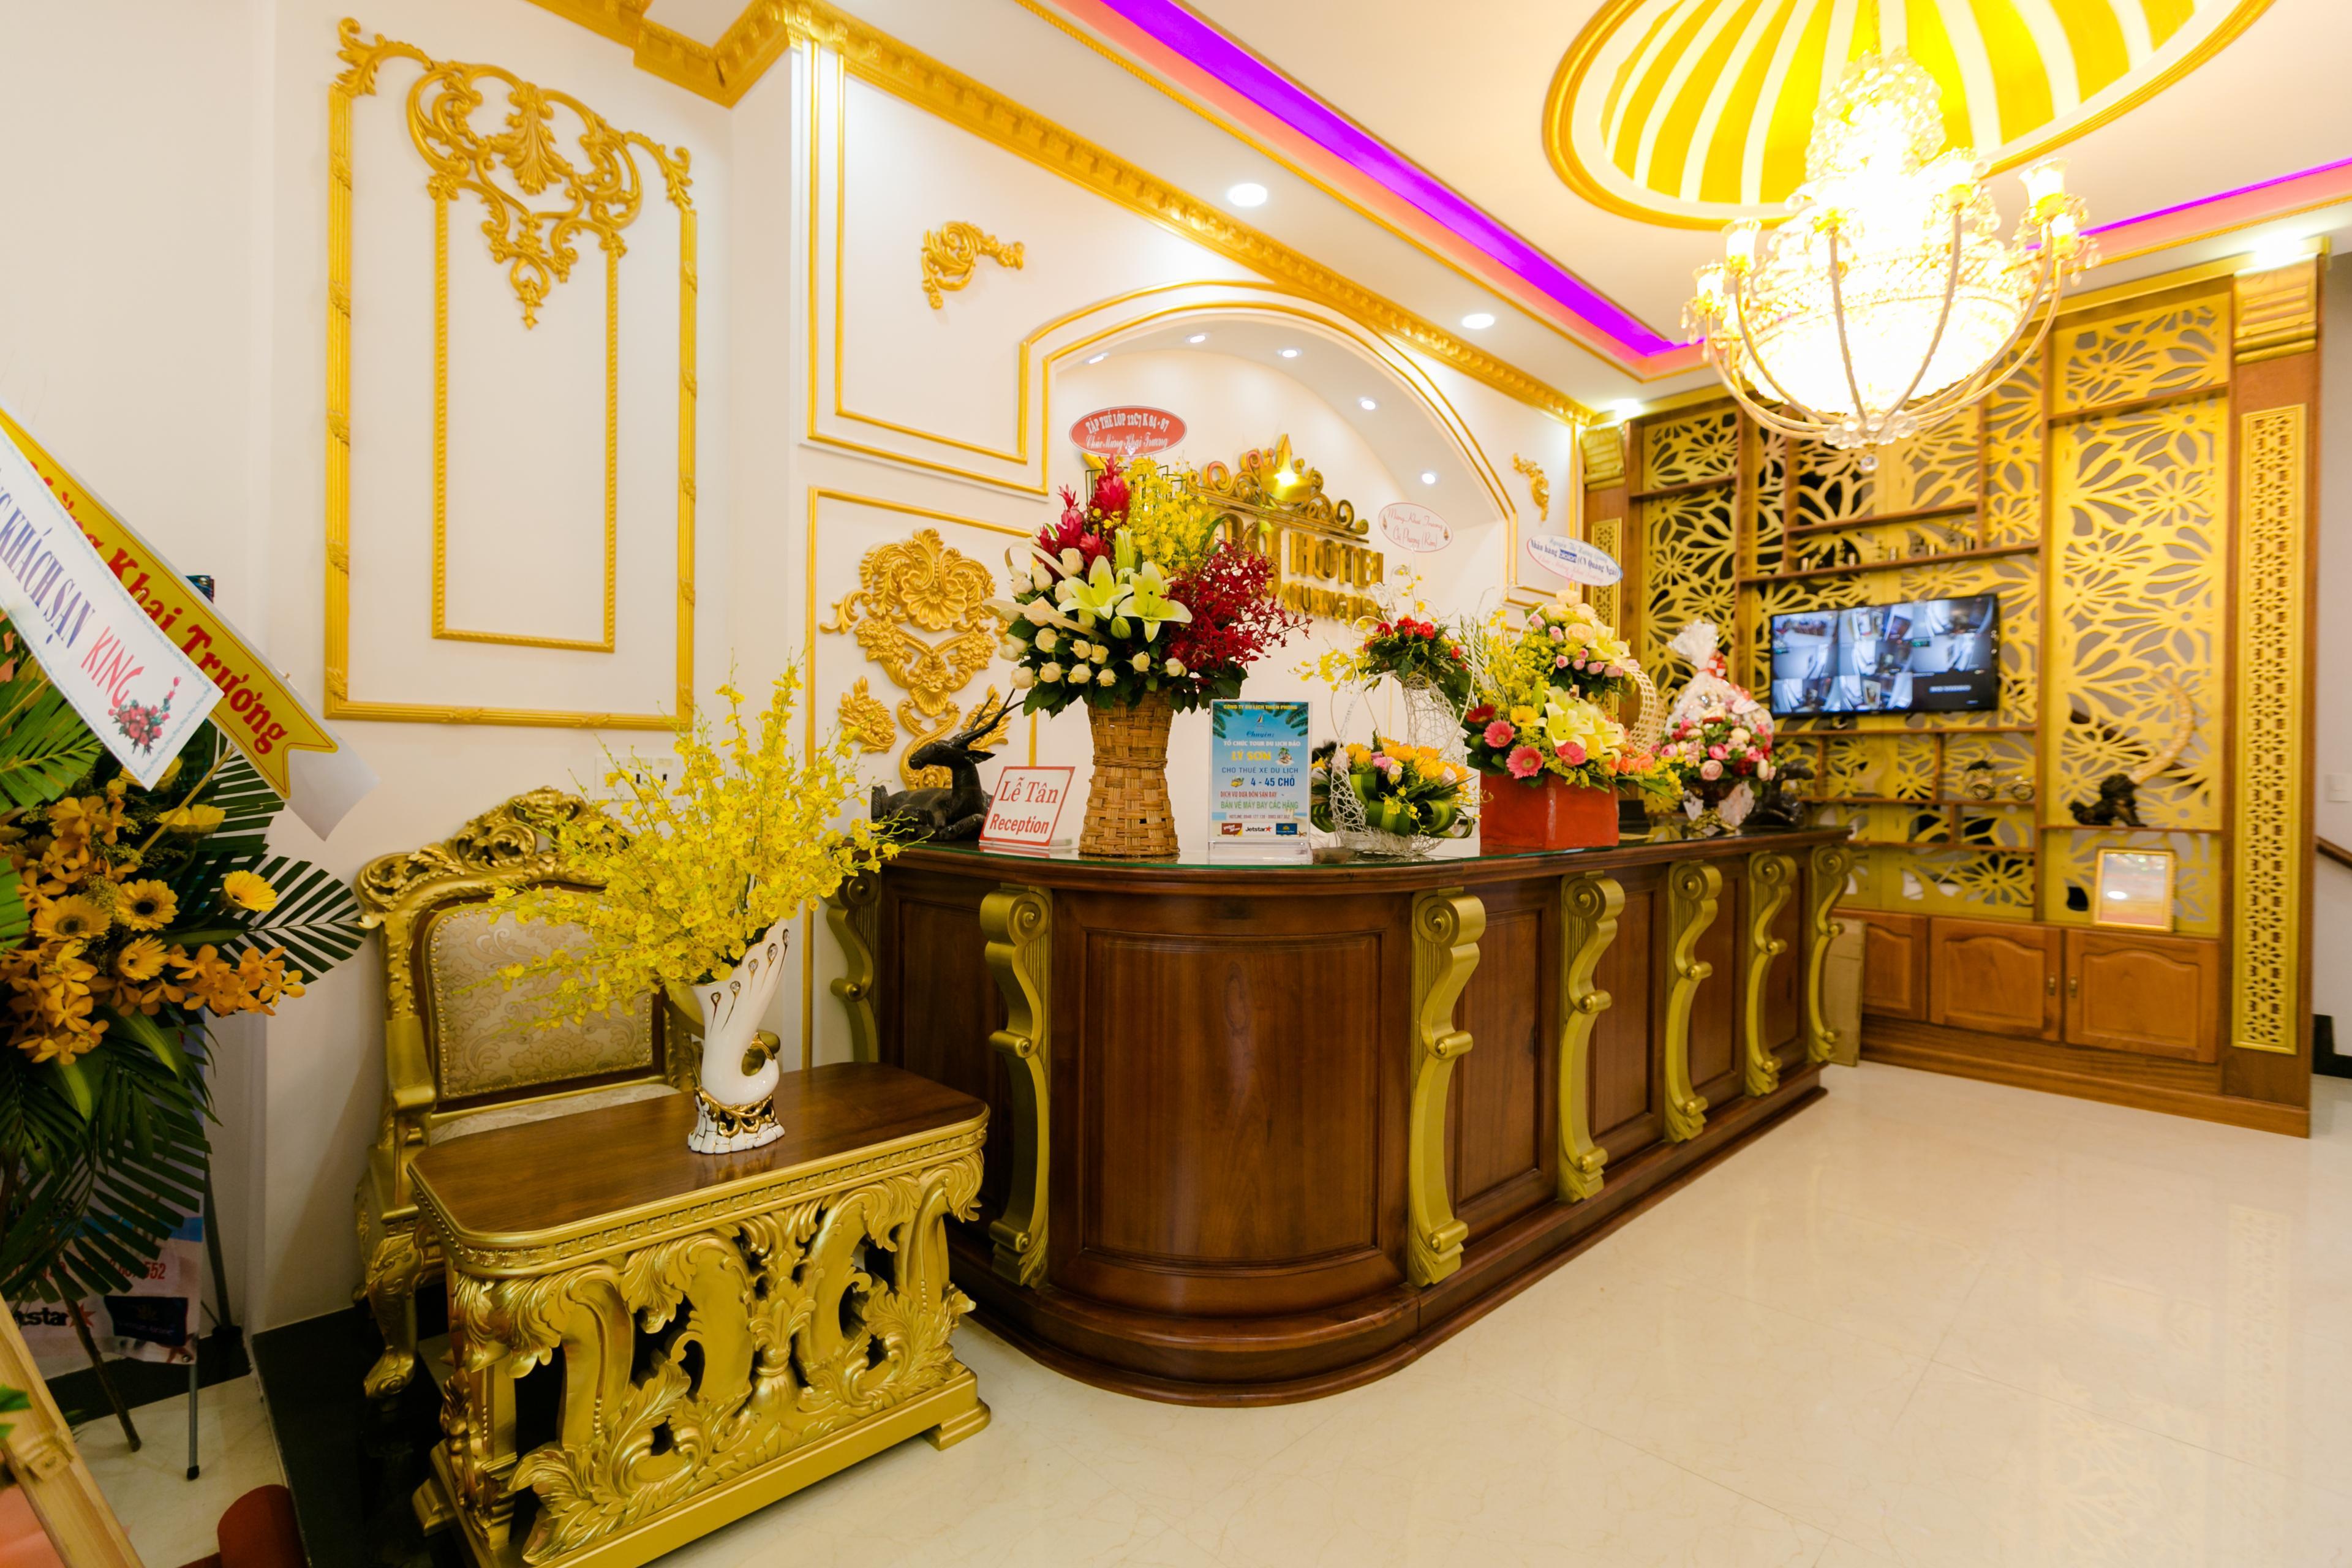 khac-san-quang-ngai-king-hotel